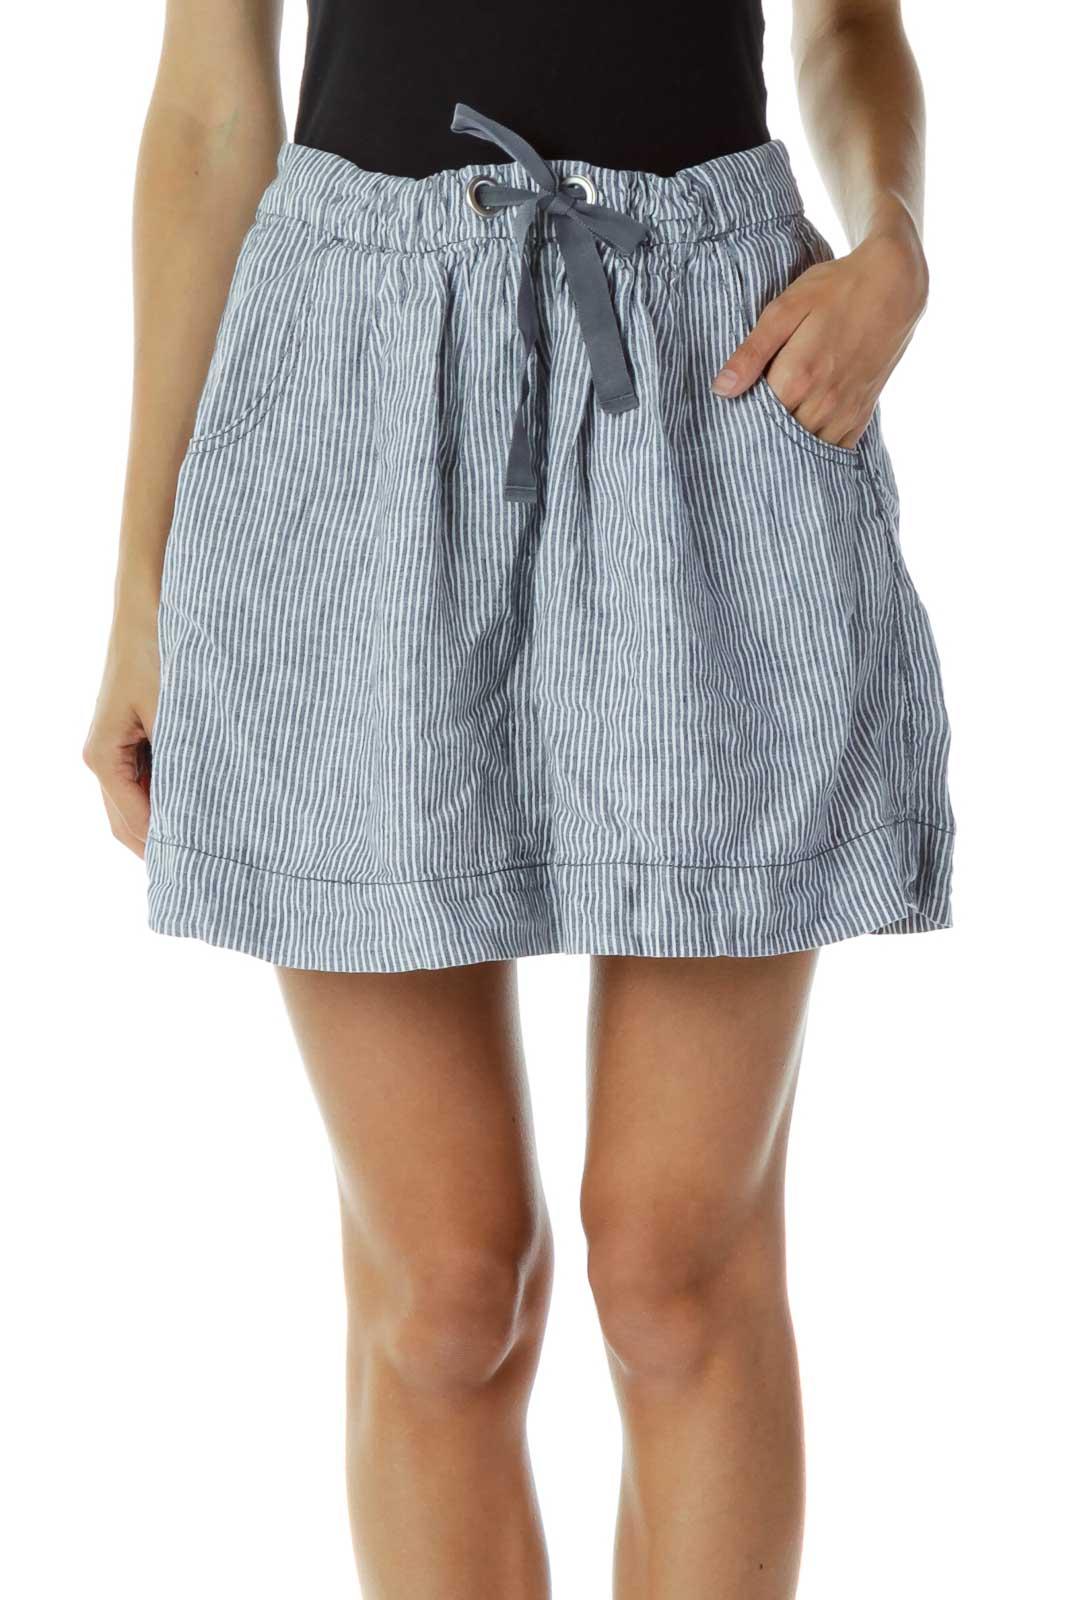 Blue White Pocketed Pinstripe Skirt Front